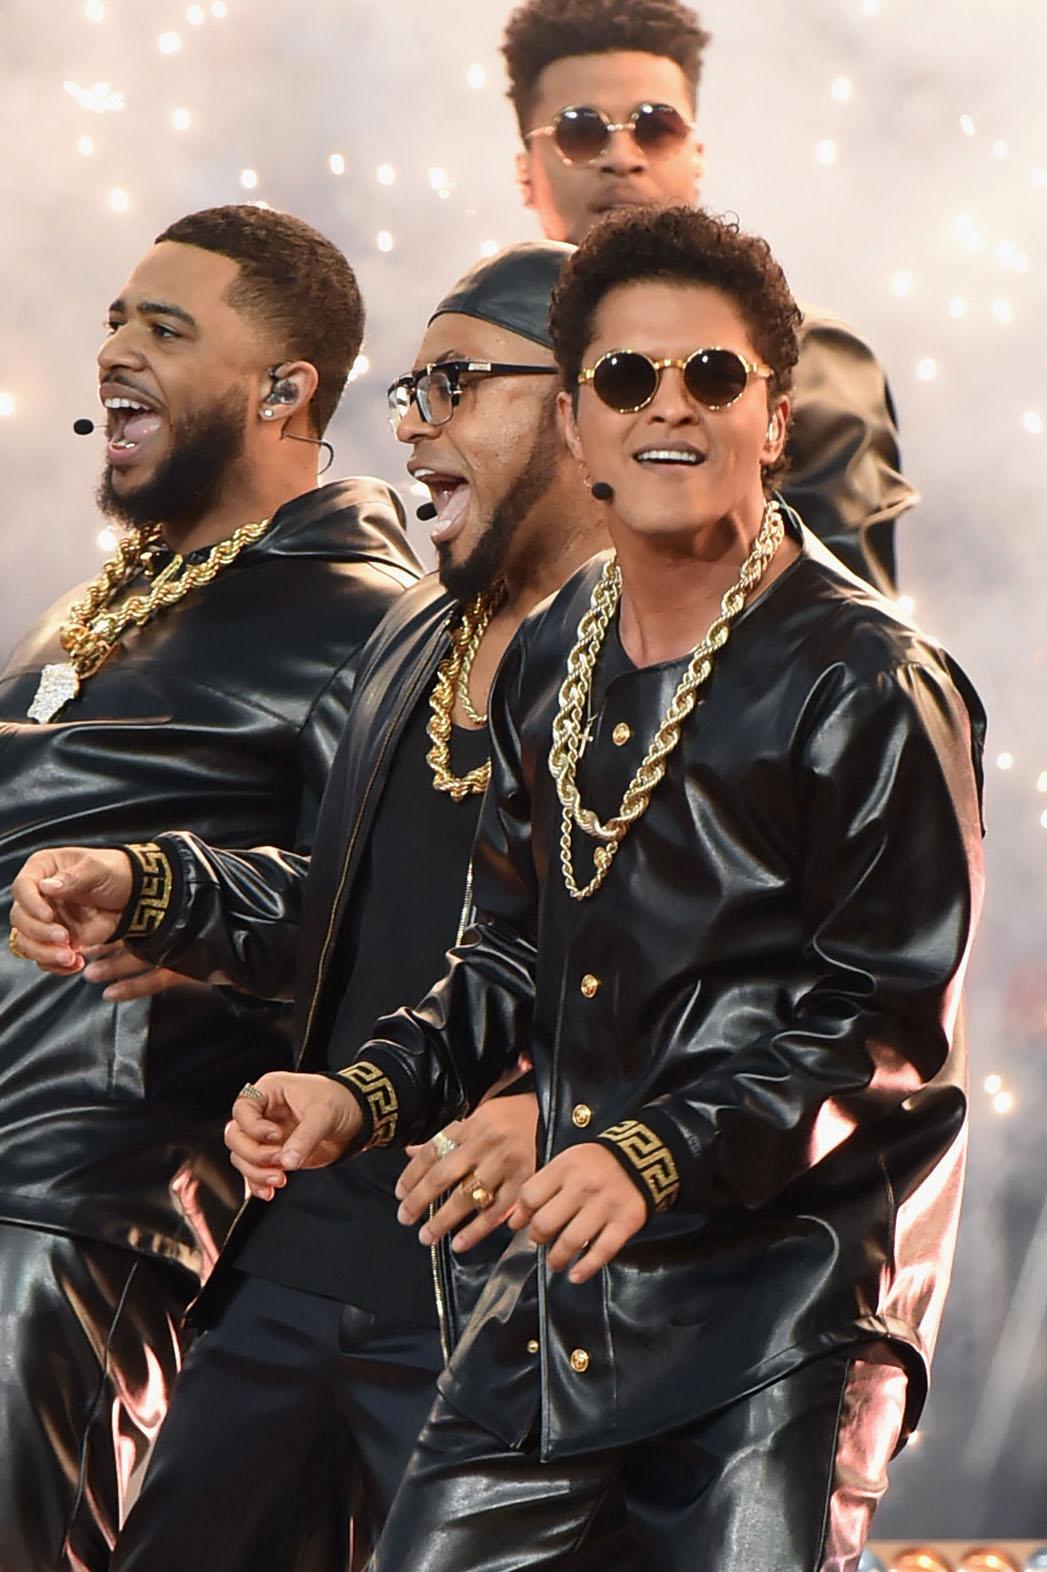 Bruno Mars  onstage during the Pepsi Super Bowl 50 Halftime Show at Levi's Stadium - P 2016